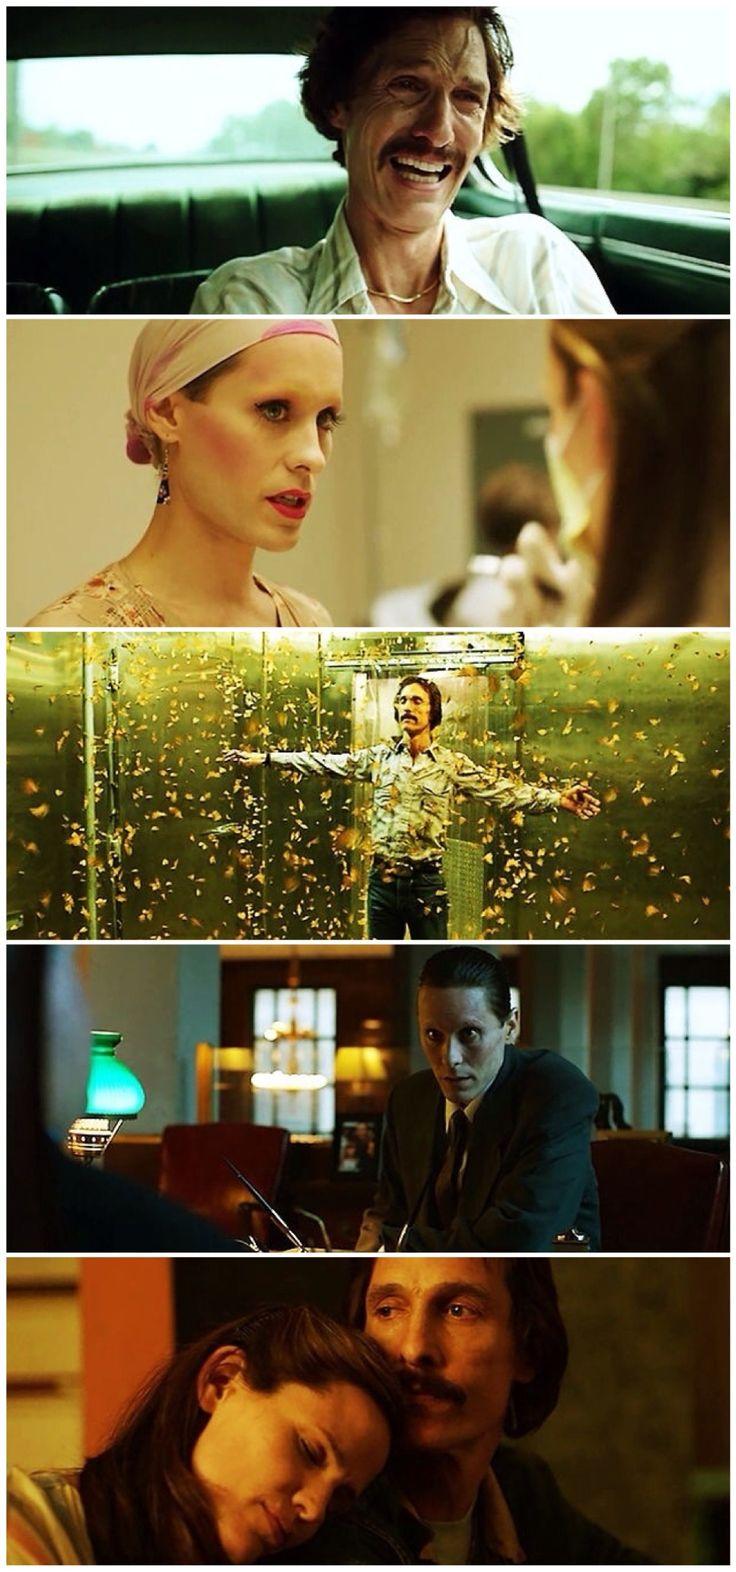 Dallas Buyers Club (Jean-Marc Vallée, 2013) #DallasBuyersClub #MatthewMcConaughey #JaredLeto